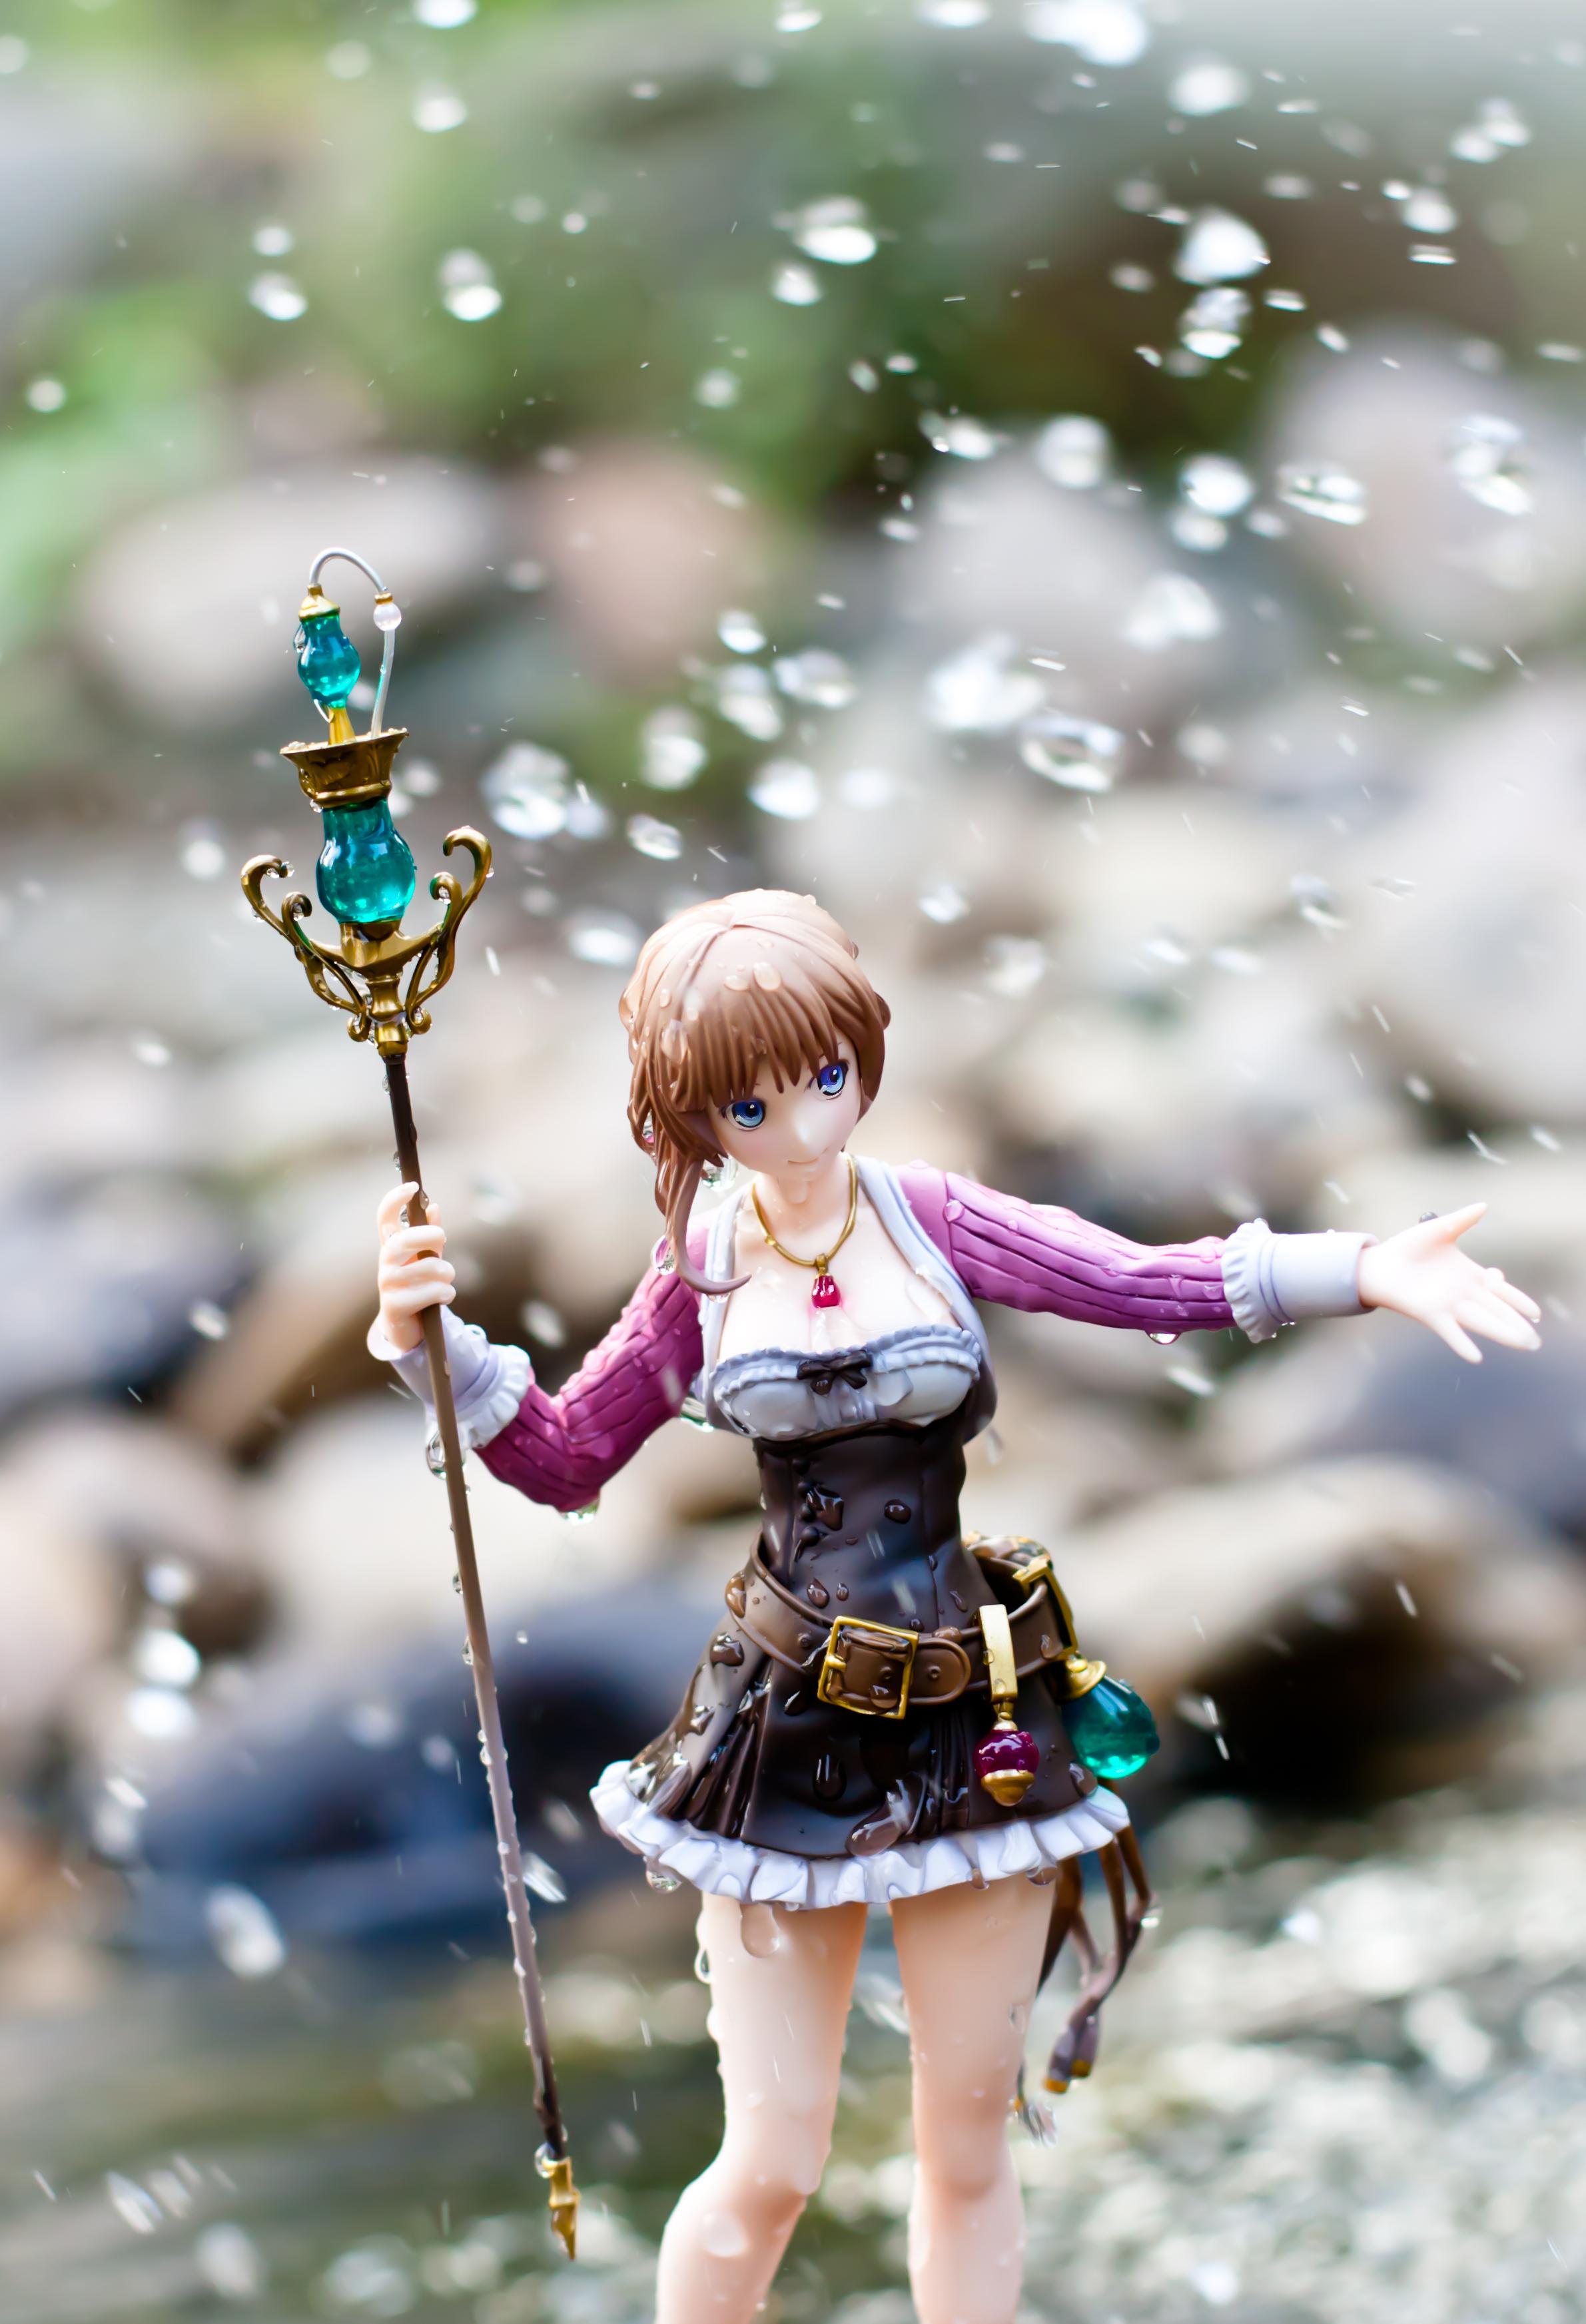 megahouse kibayashi_norio kishida_mel high_priestess atelier_rorona_~arland_no_renkinjutsushi~ rororina_fryxell